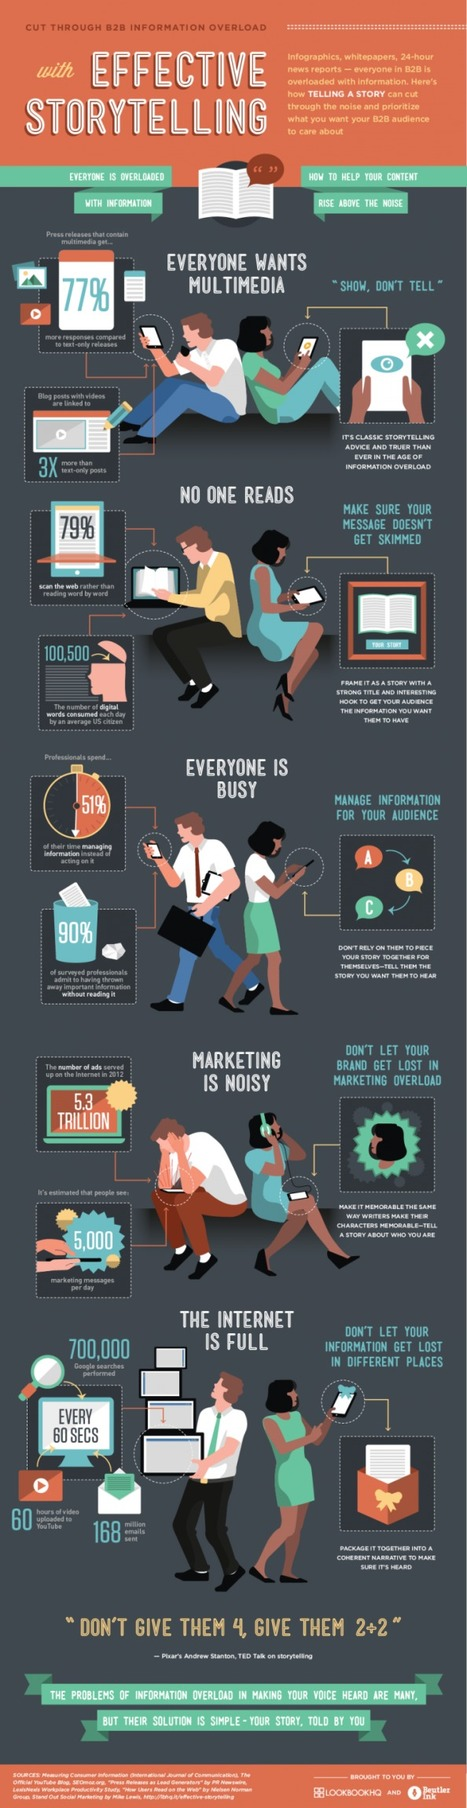 Effective Storytelling for B2B   Pinterest   #TheMarketingAutomationAlert   Social Media   Scoop.it